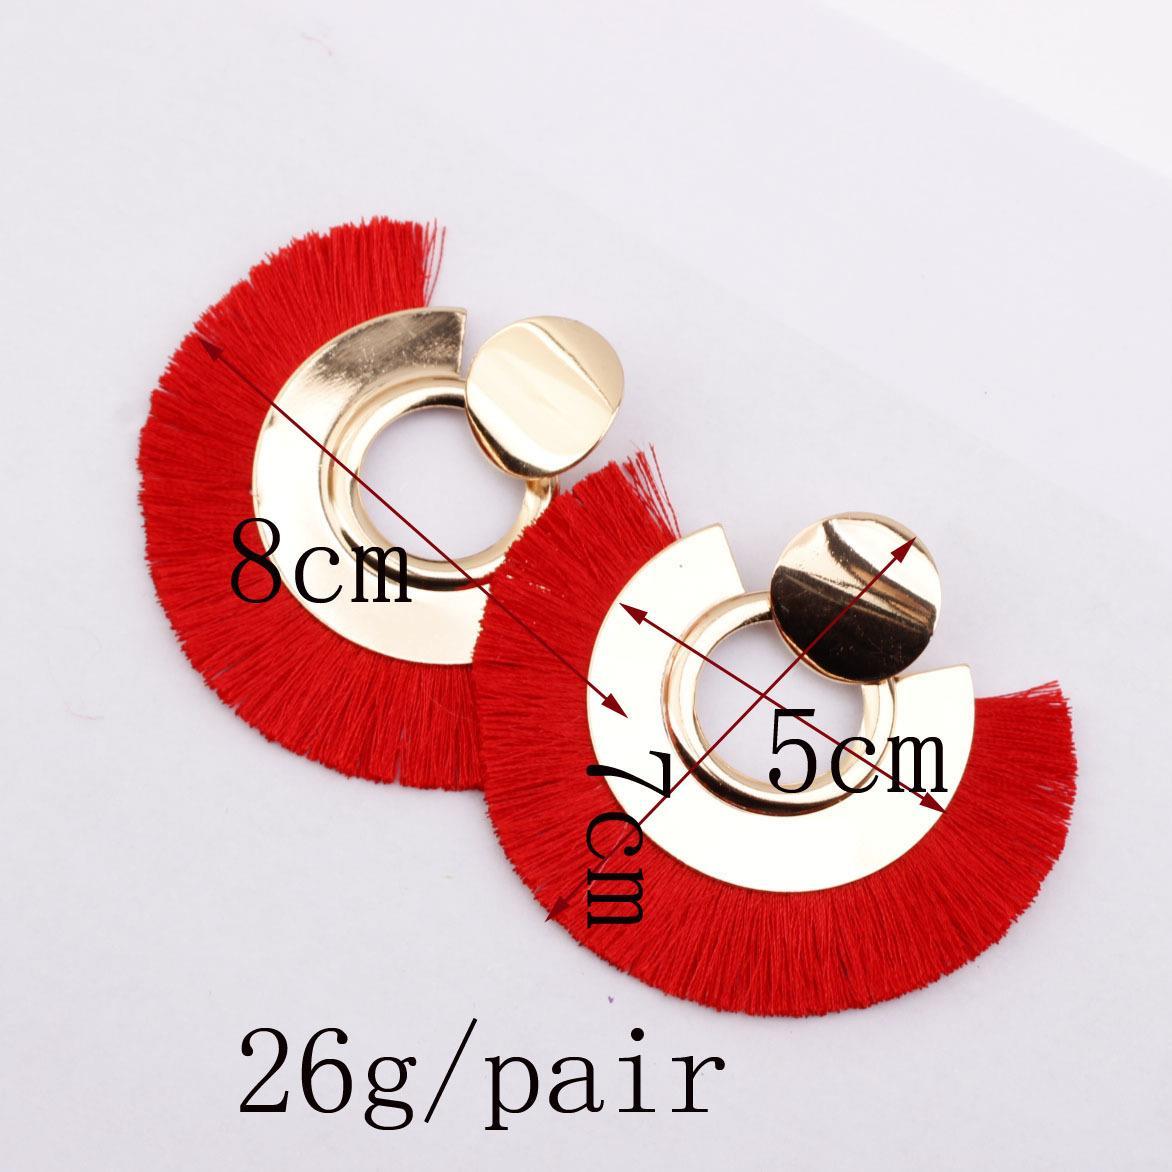 Women-Fashion-Rhinestone-Long-Tassel-Dangle-Earrings-Fringe-Drop-Jewelry-Gift-UK thumbnail 179